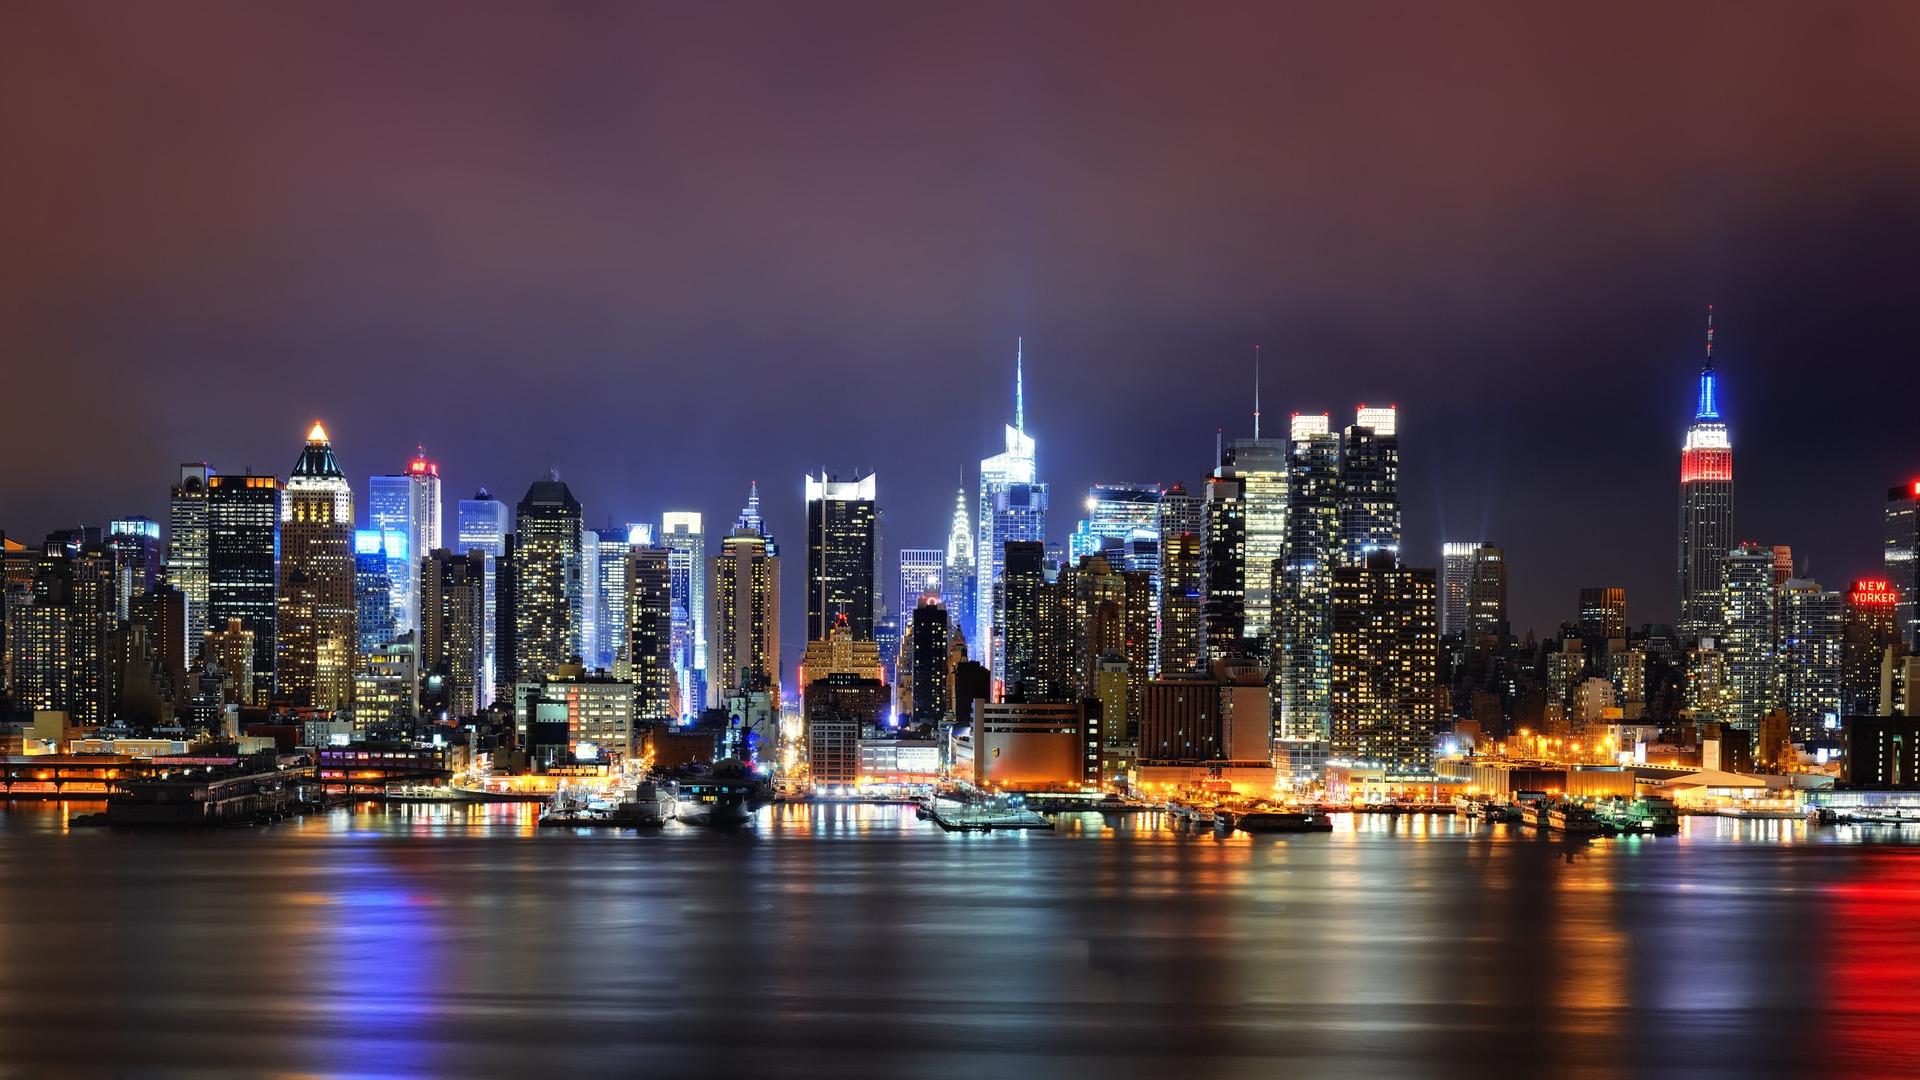 New york city wallpaper 18010 1920x1080 px hdwallsource new york city wallpaper 18010 voltagebd Image collections